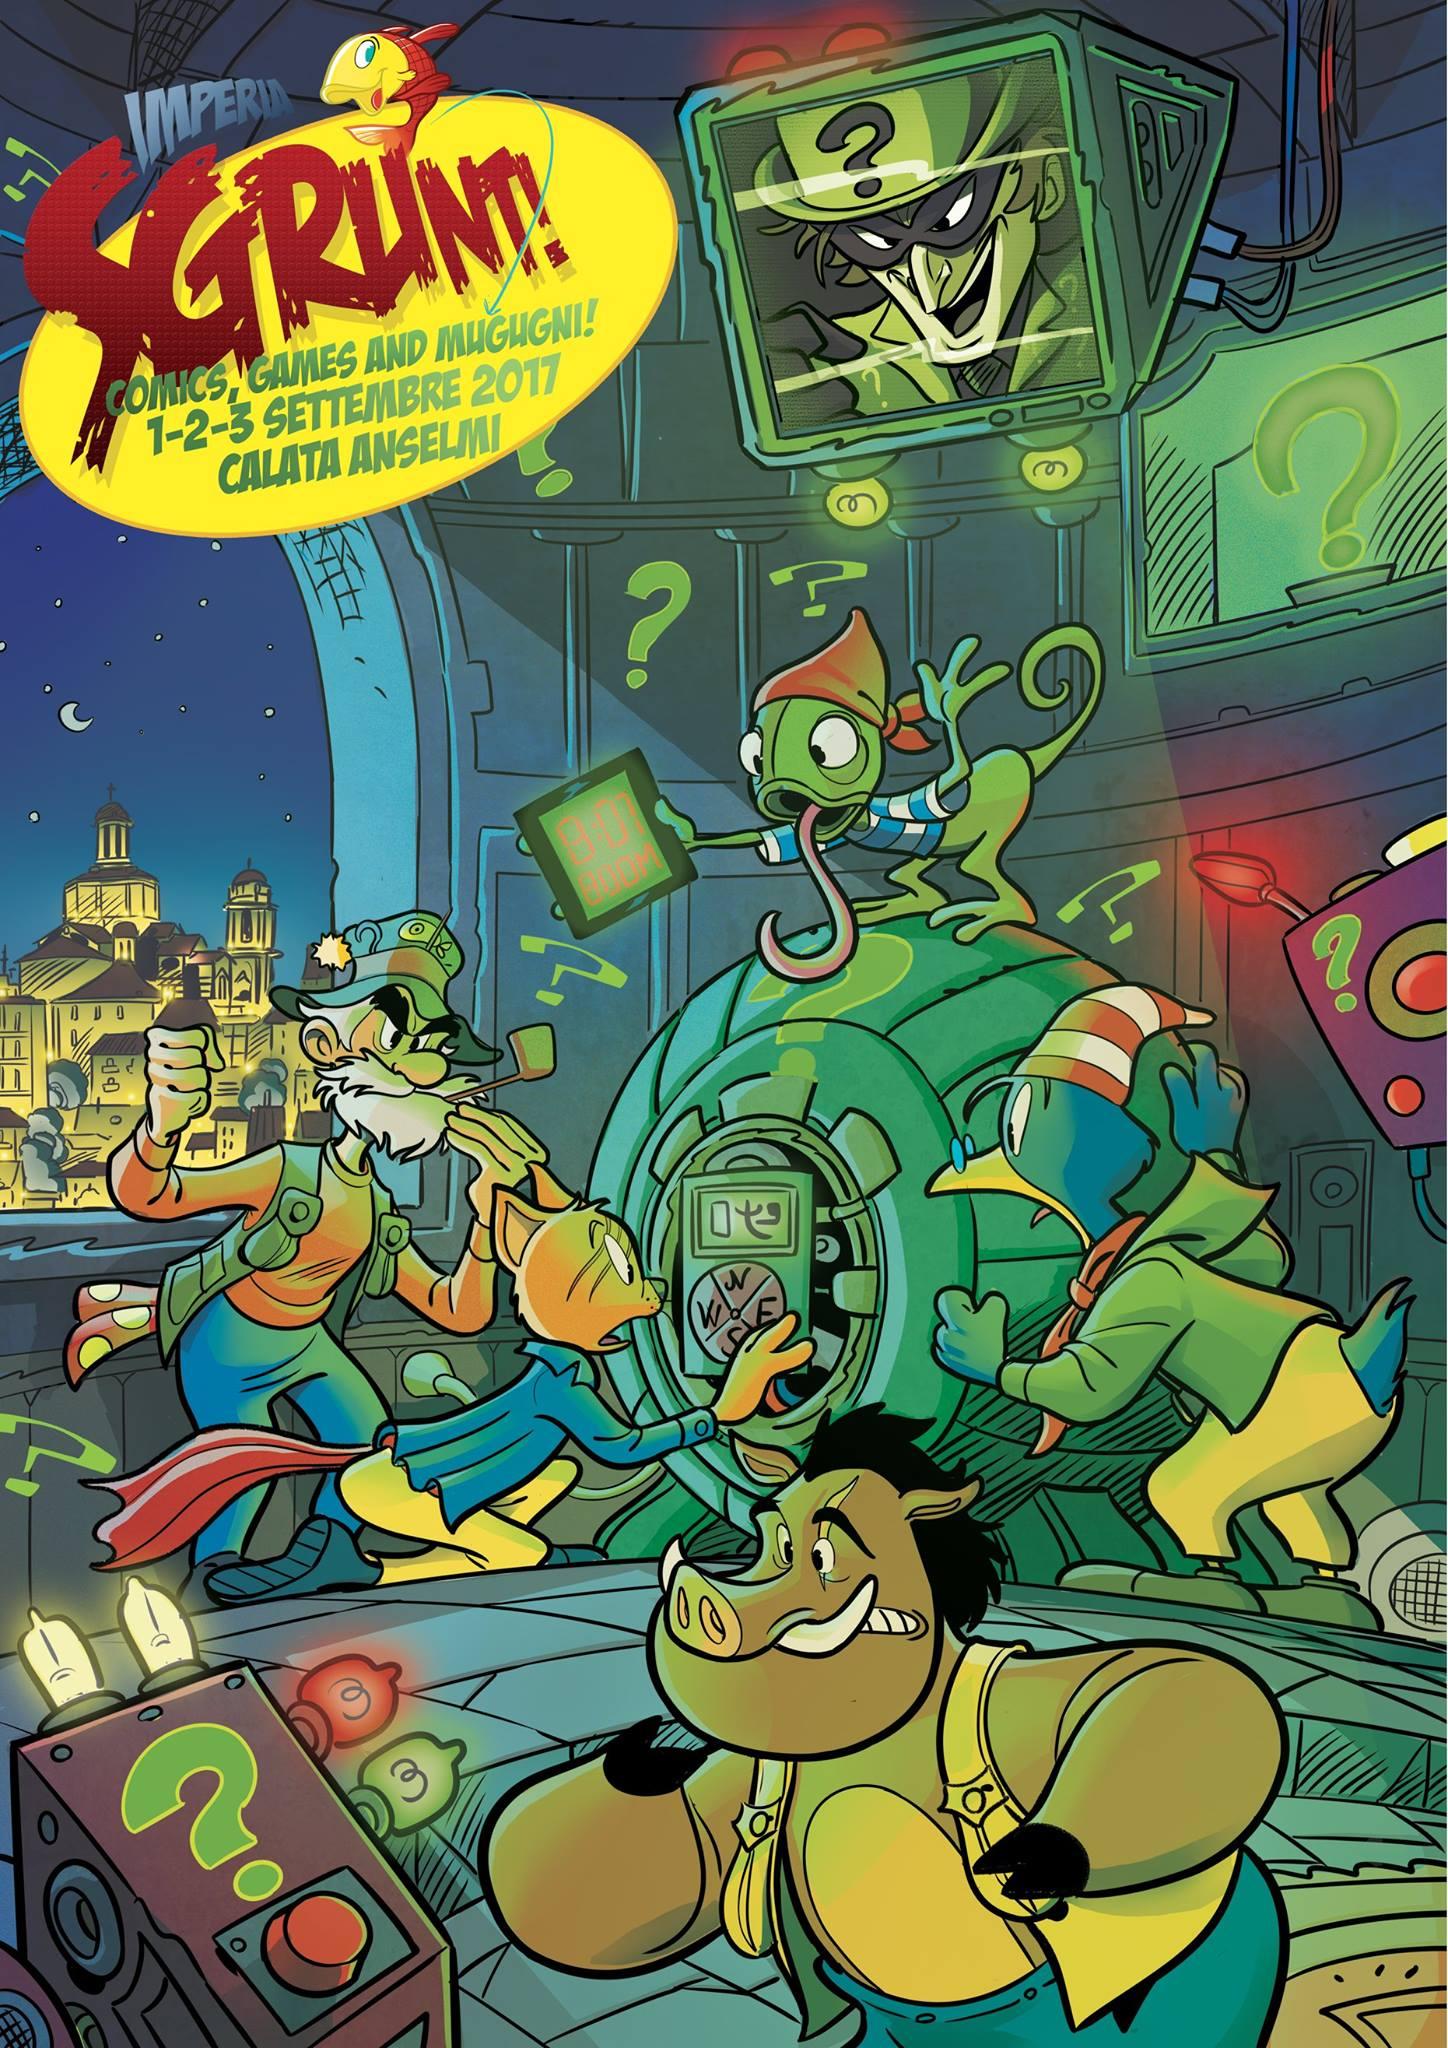 Comics, games and mugugni in Calata Anselmi a Porto Maurizio